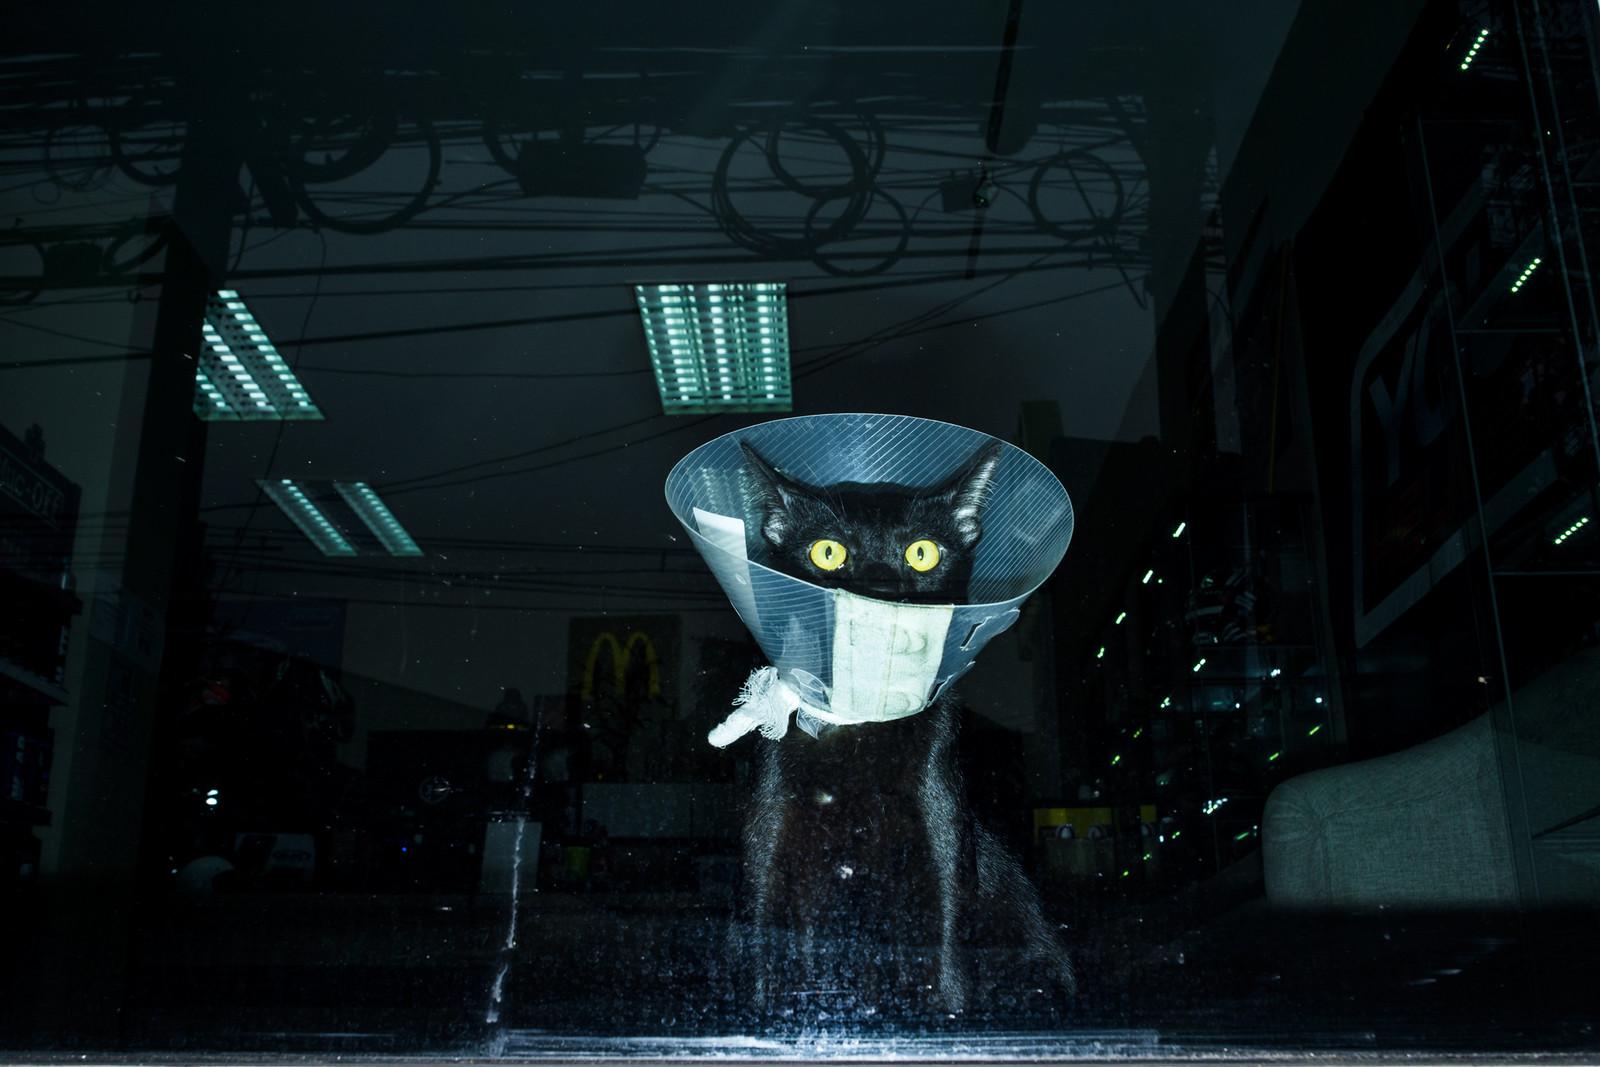 #07 Black Cat | by Tavepong Pratoomwong